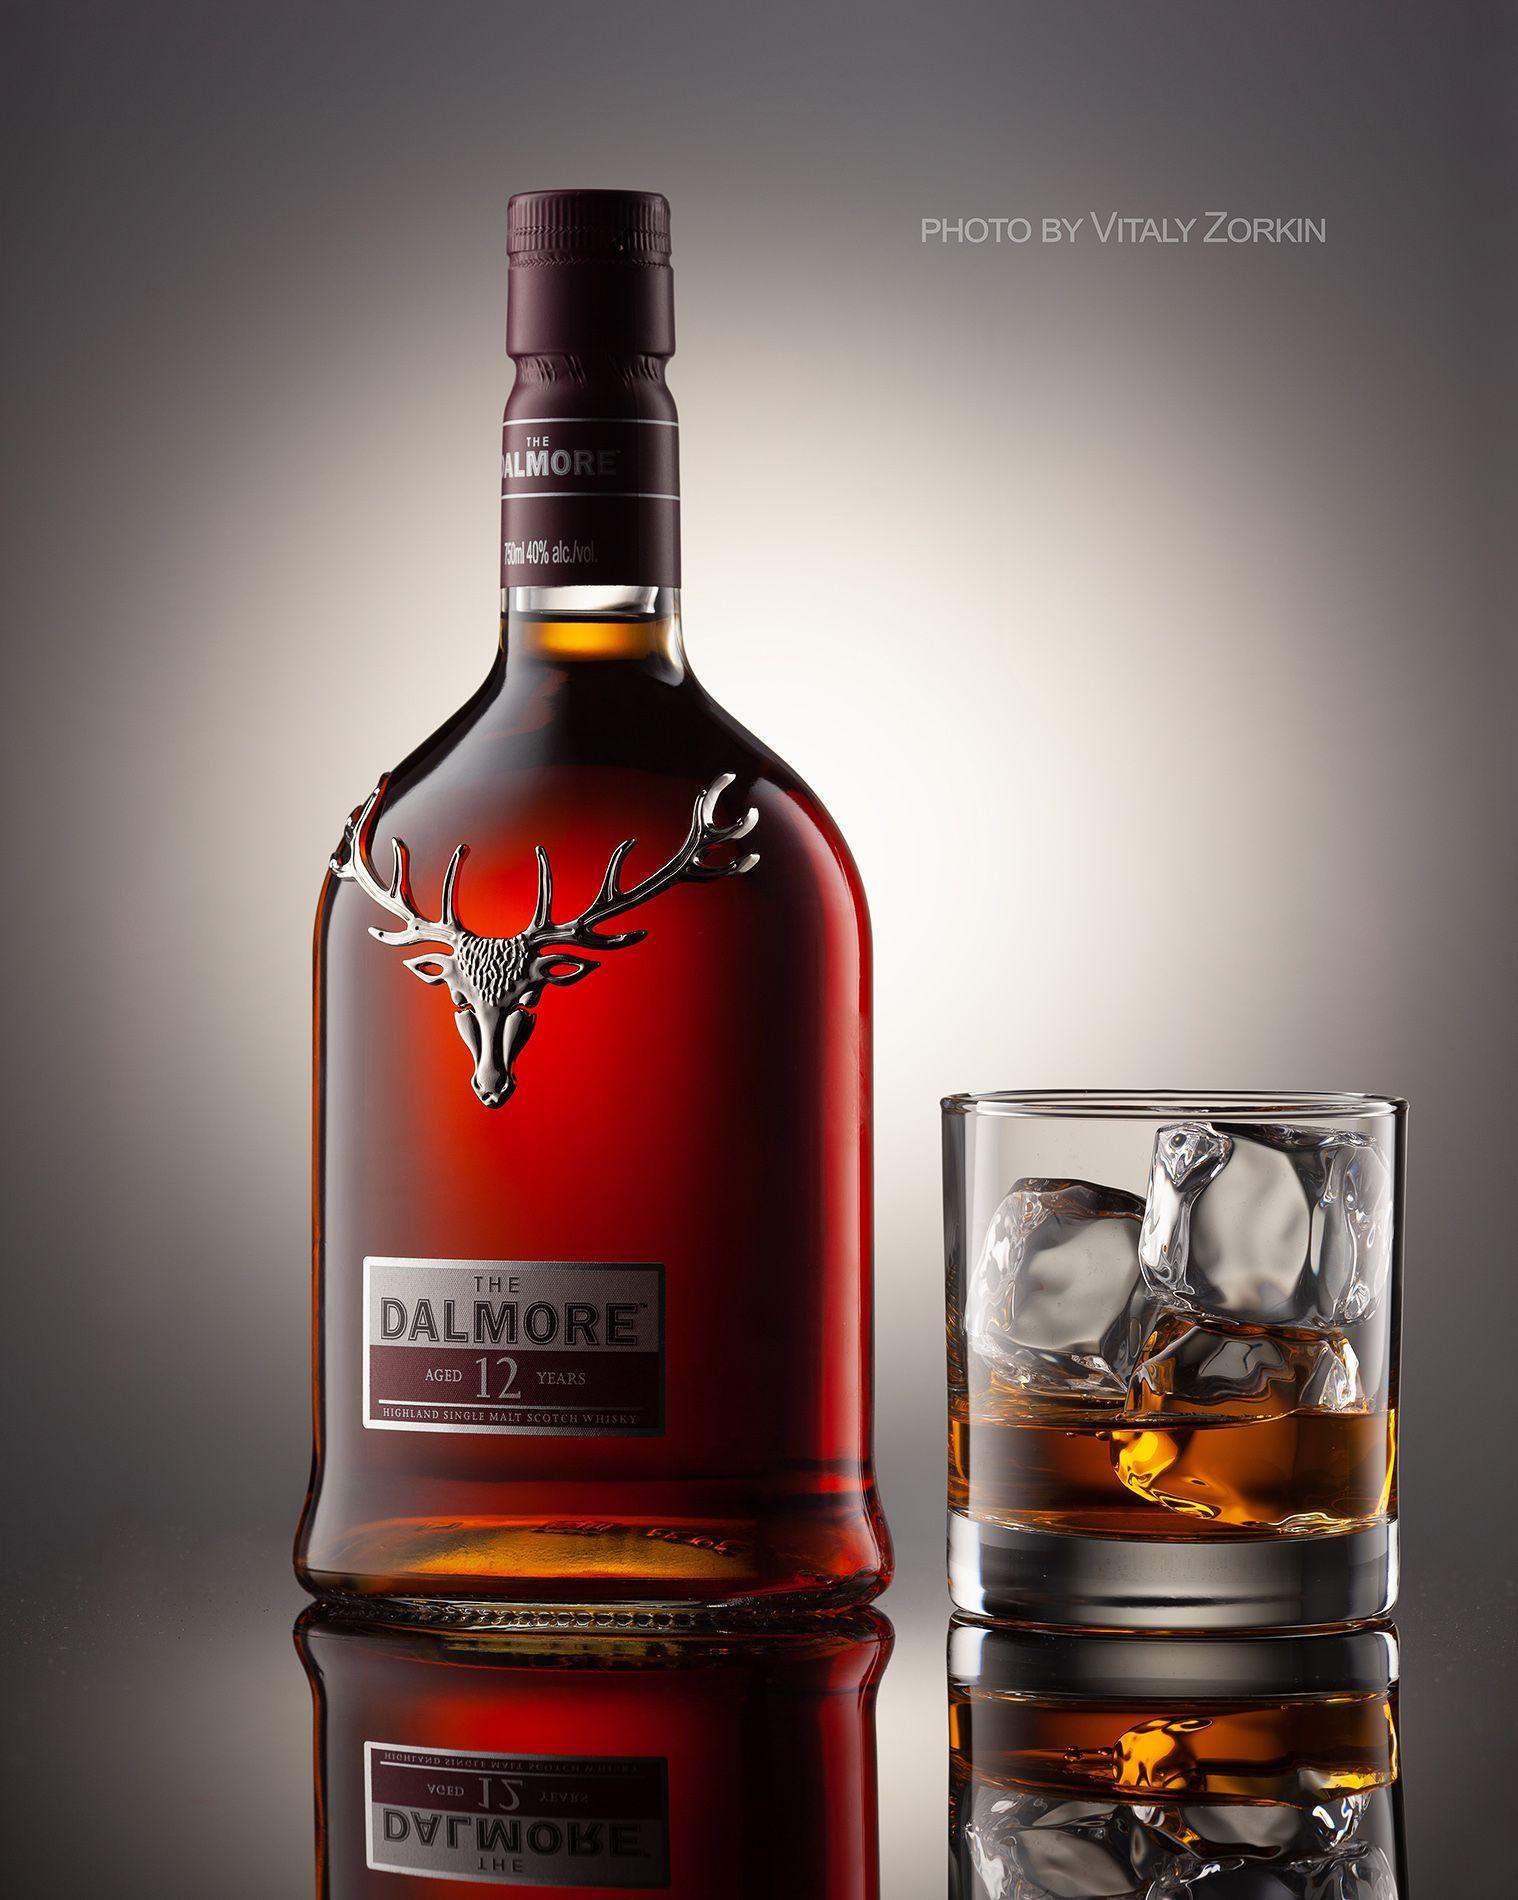 Thedalmore Whisky By Vitalyzorkin Photographer Advertising Whiskey Bottle Macallan Whiskey Bottle